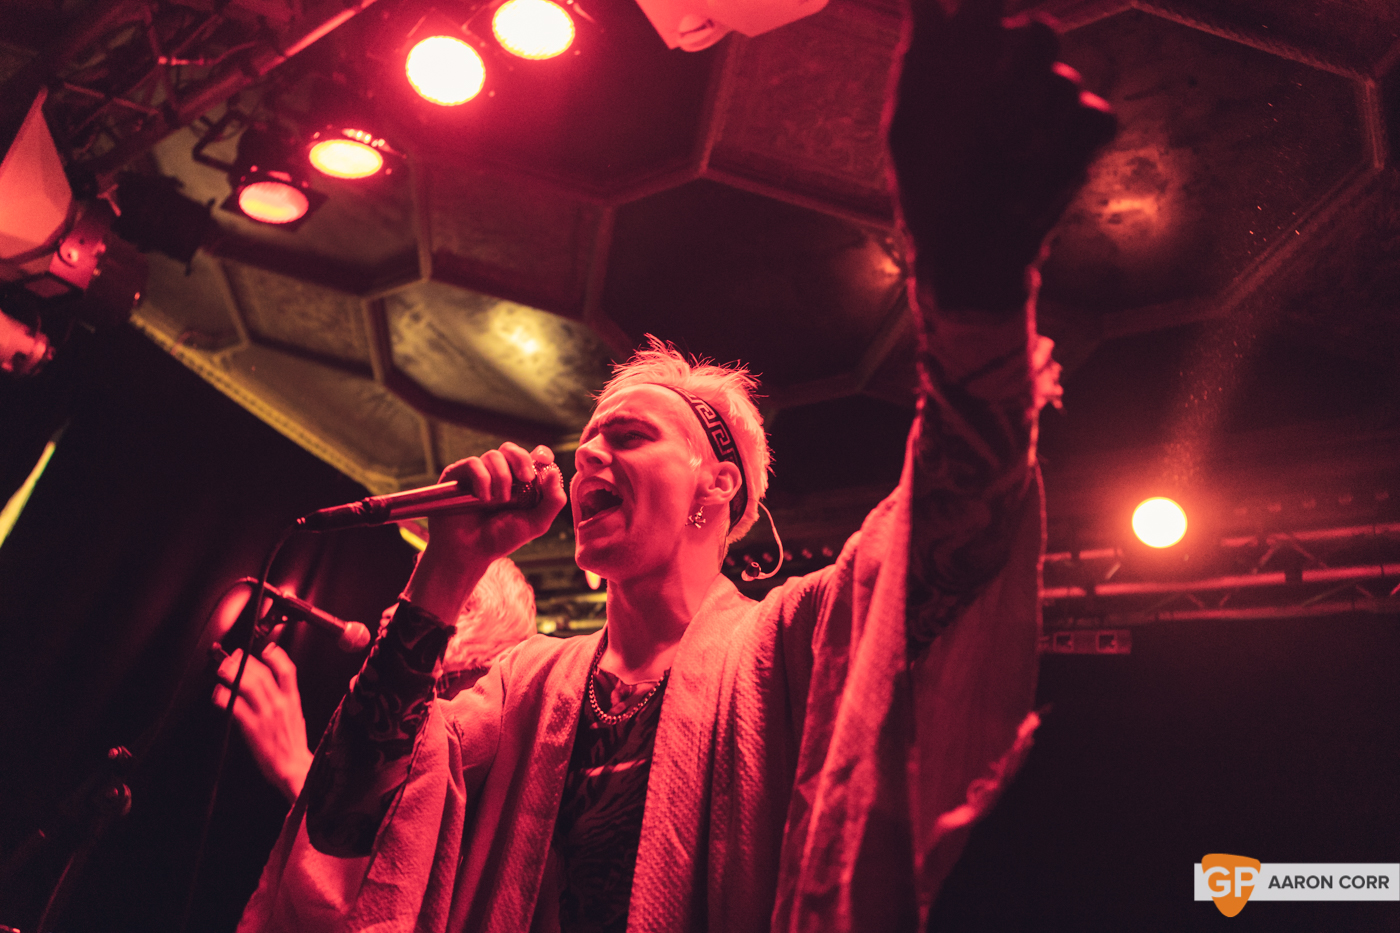 HMLTD live at The Sound House, Dublin on 17-Feb-20 by Aaron Corr-2183